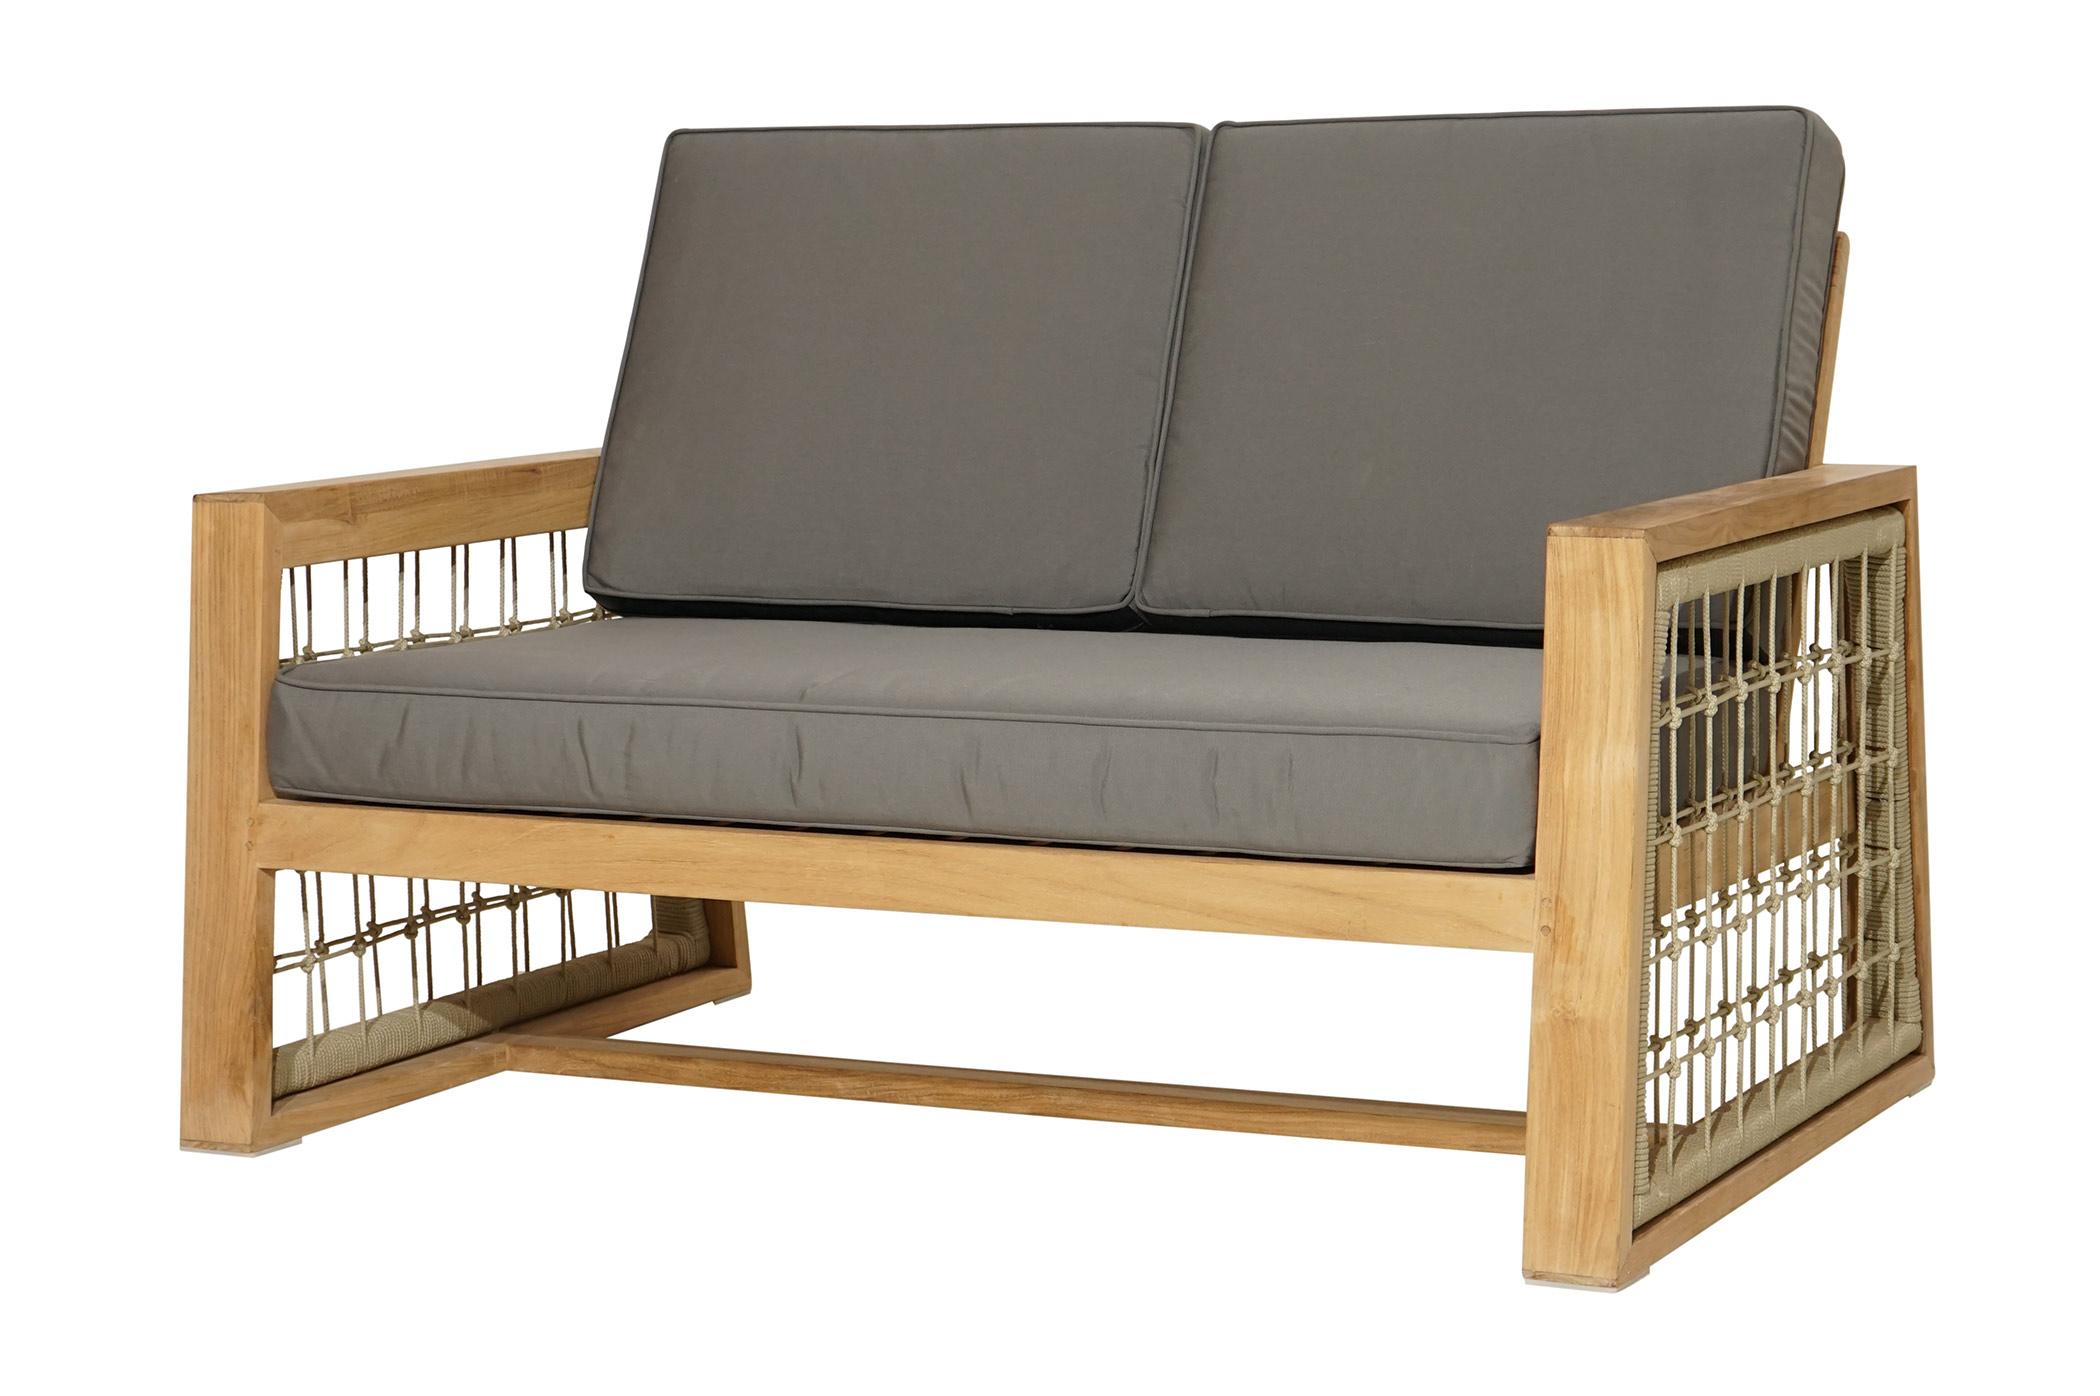 loungesofa martinique premium teak inkl polster loungem bel gartenm bel gardanio ihr. Black Bedroom Furniture Sets. Home Design Ideas